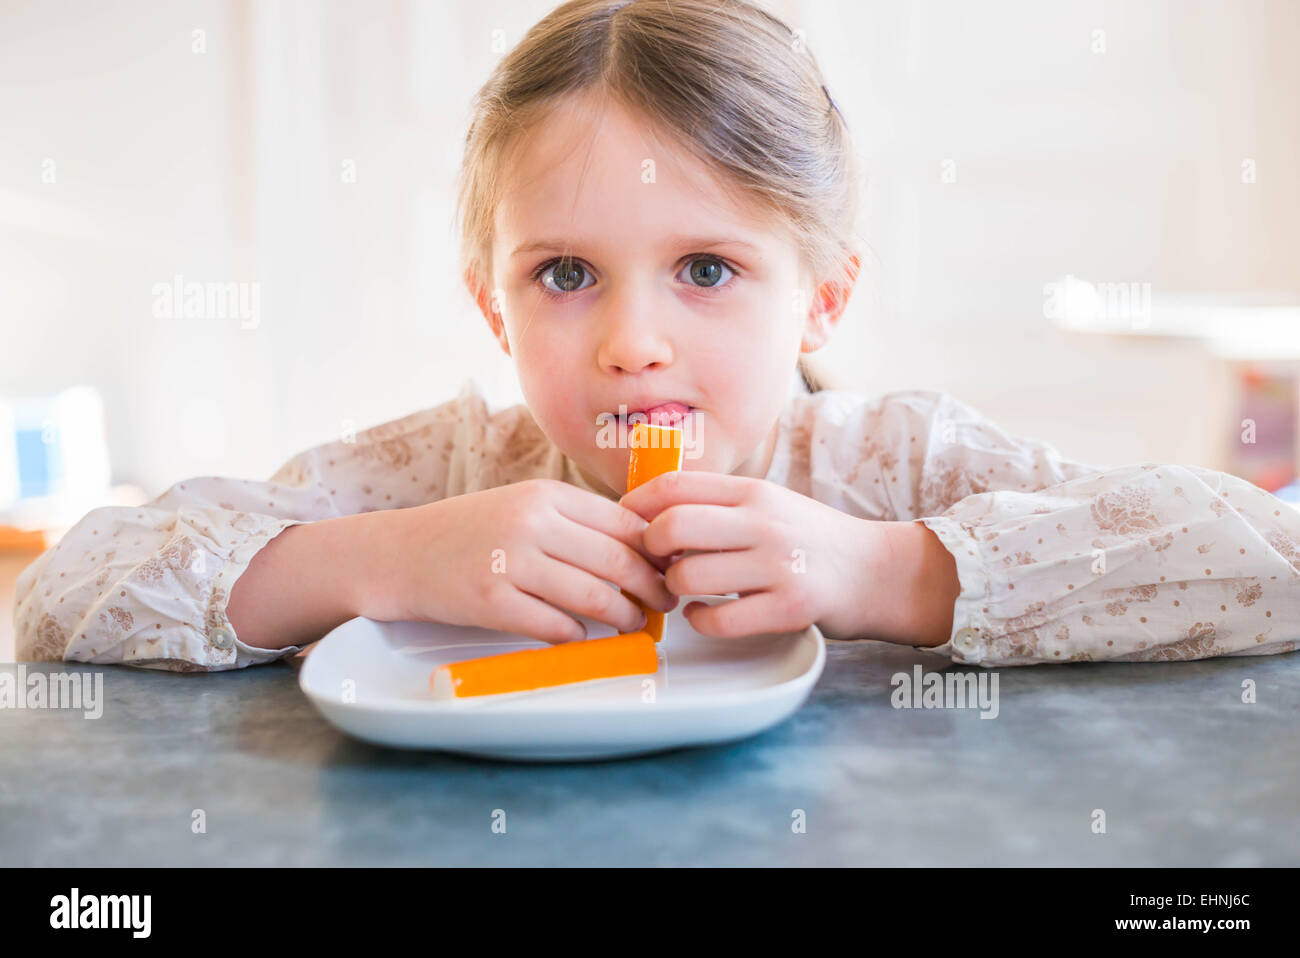 5 year-old girl eating surimi. - Stock Image